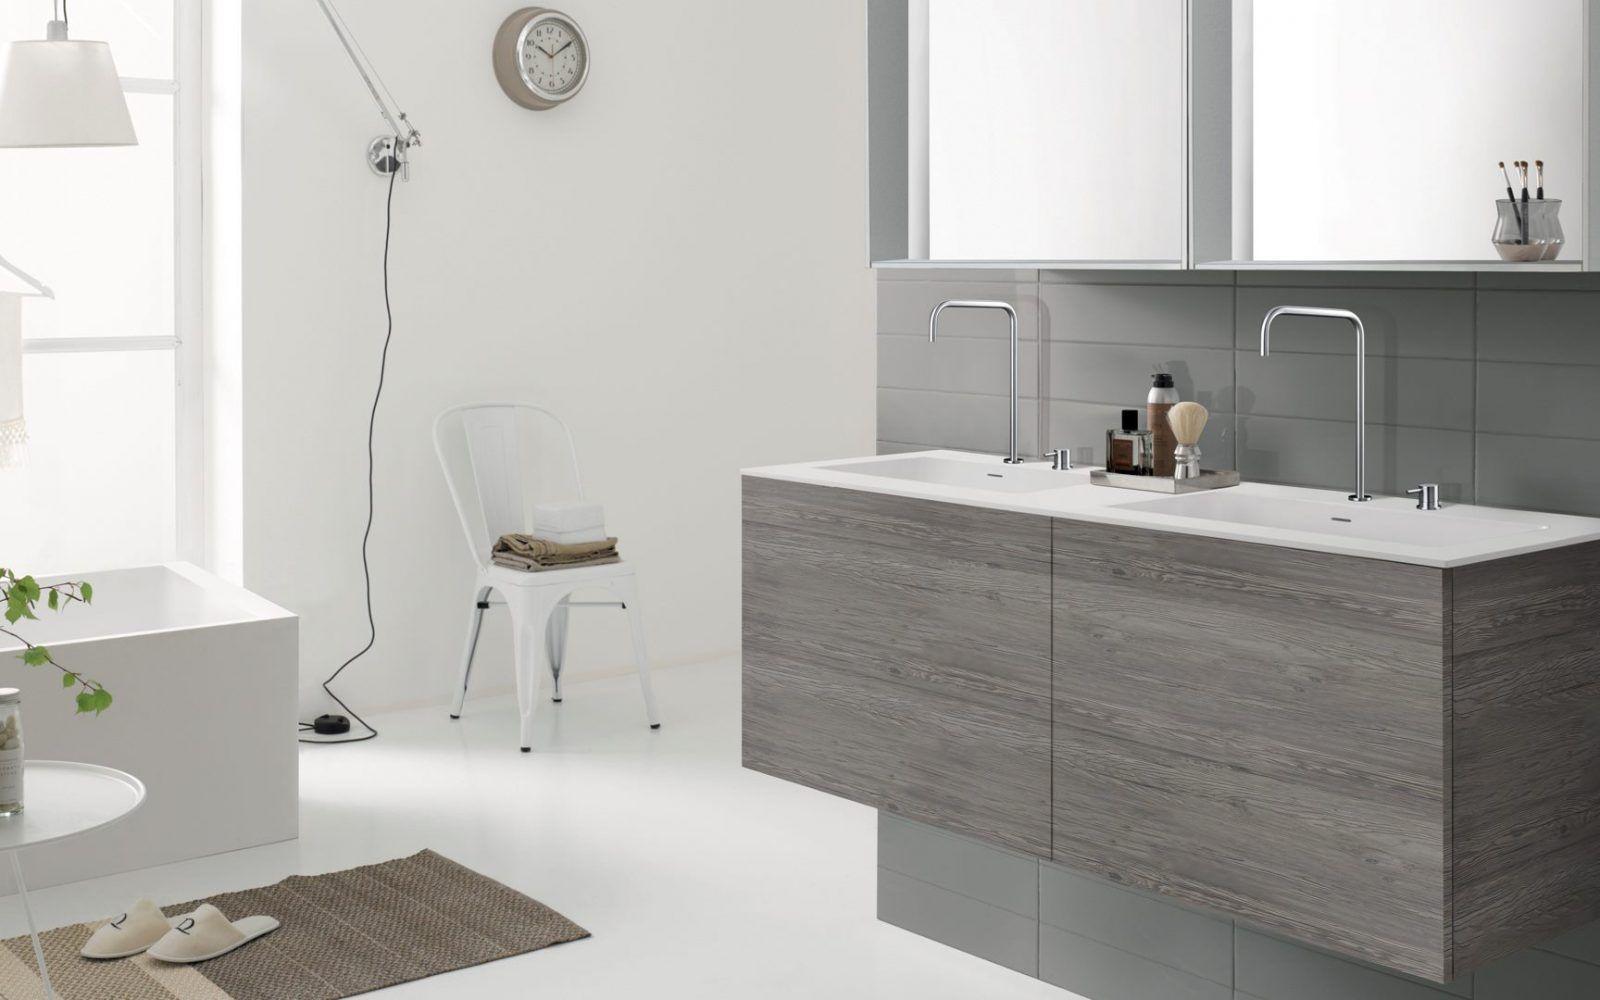 RM Living Cincinnati Modern Interior Design Bathroom By Blu Bathworks Blu13